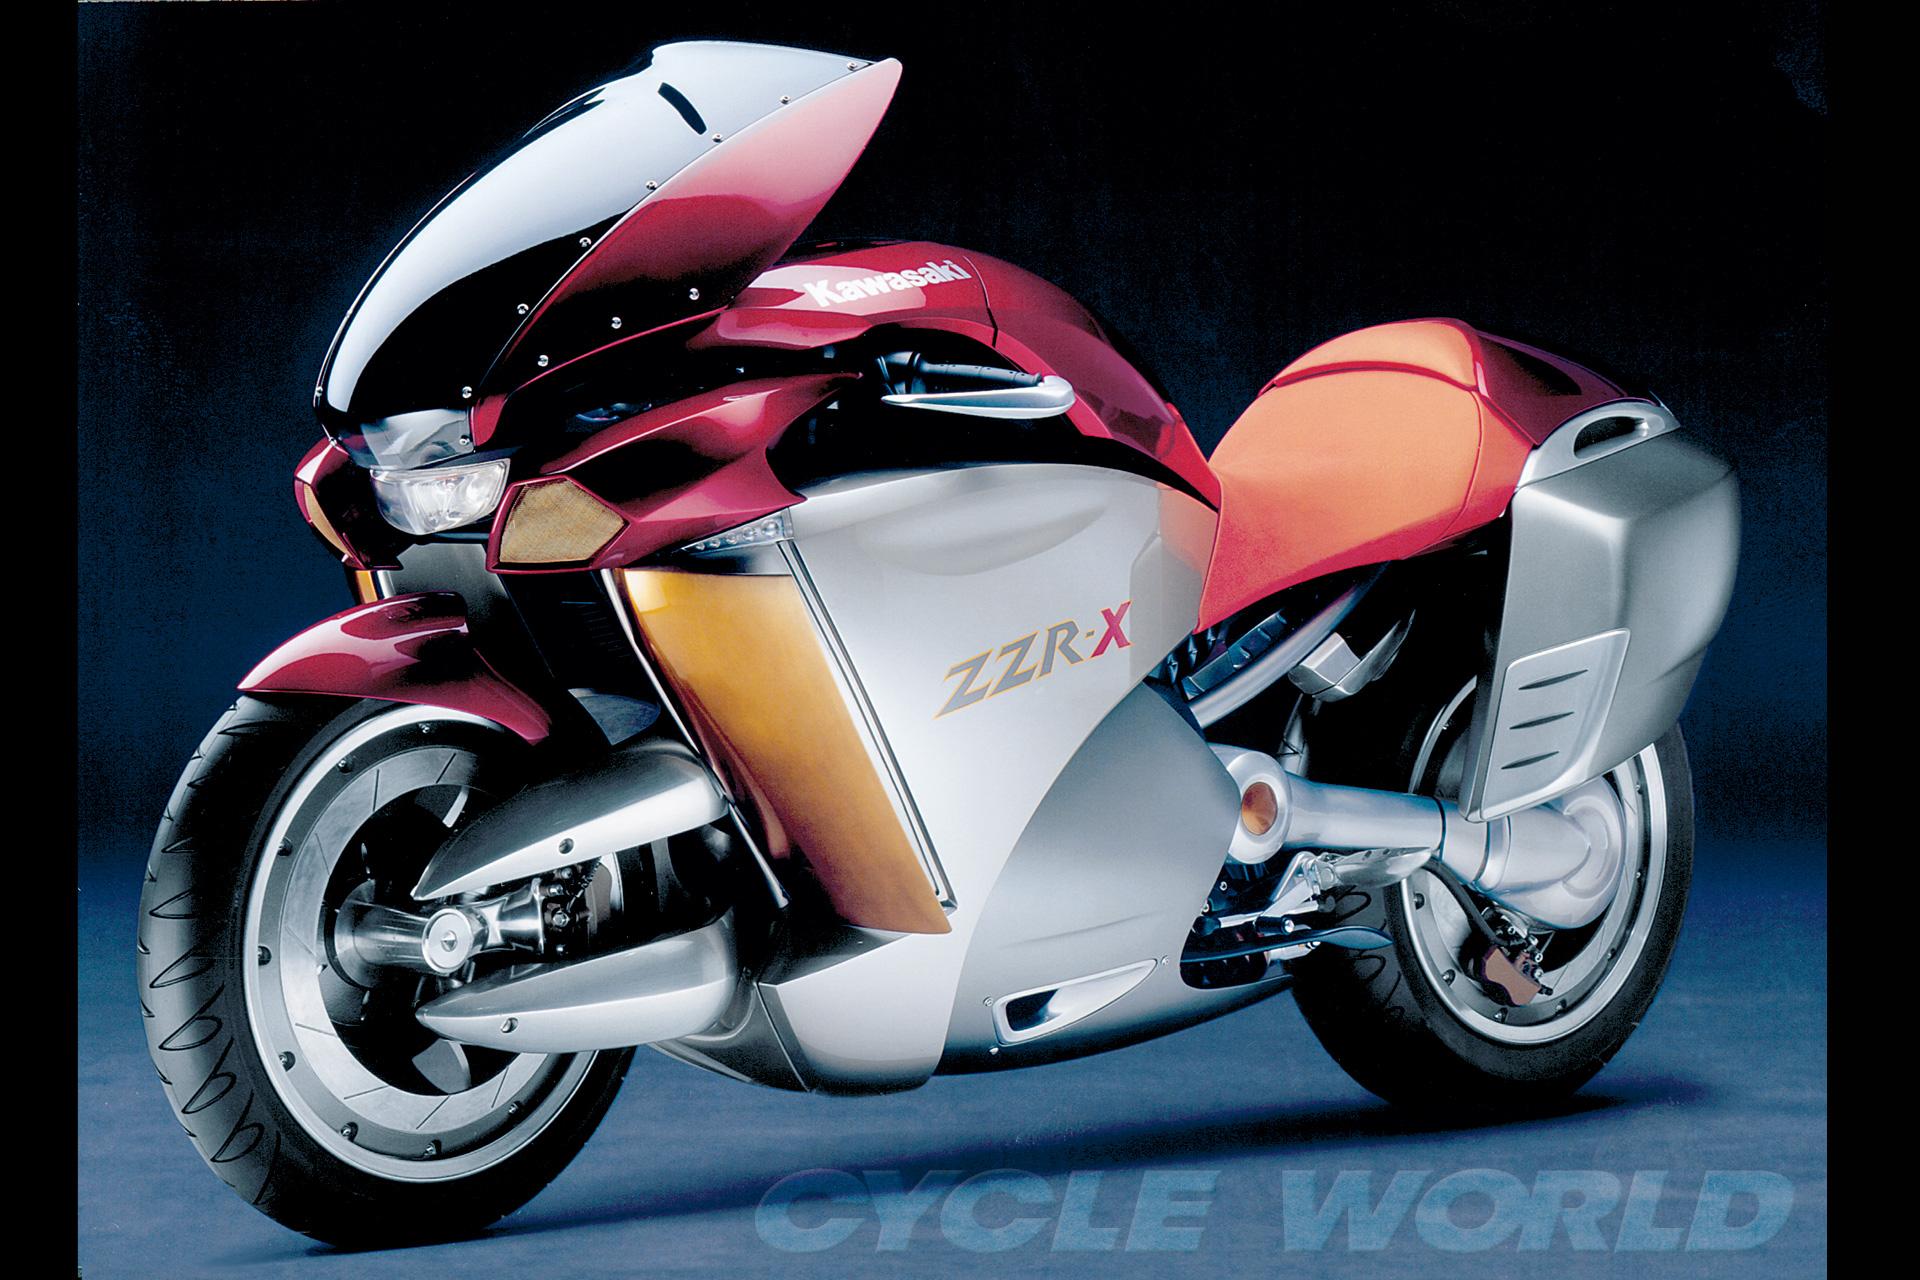 Kawasaki ZZR-X